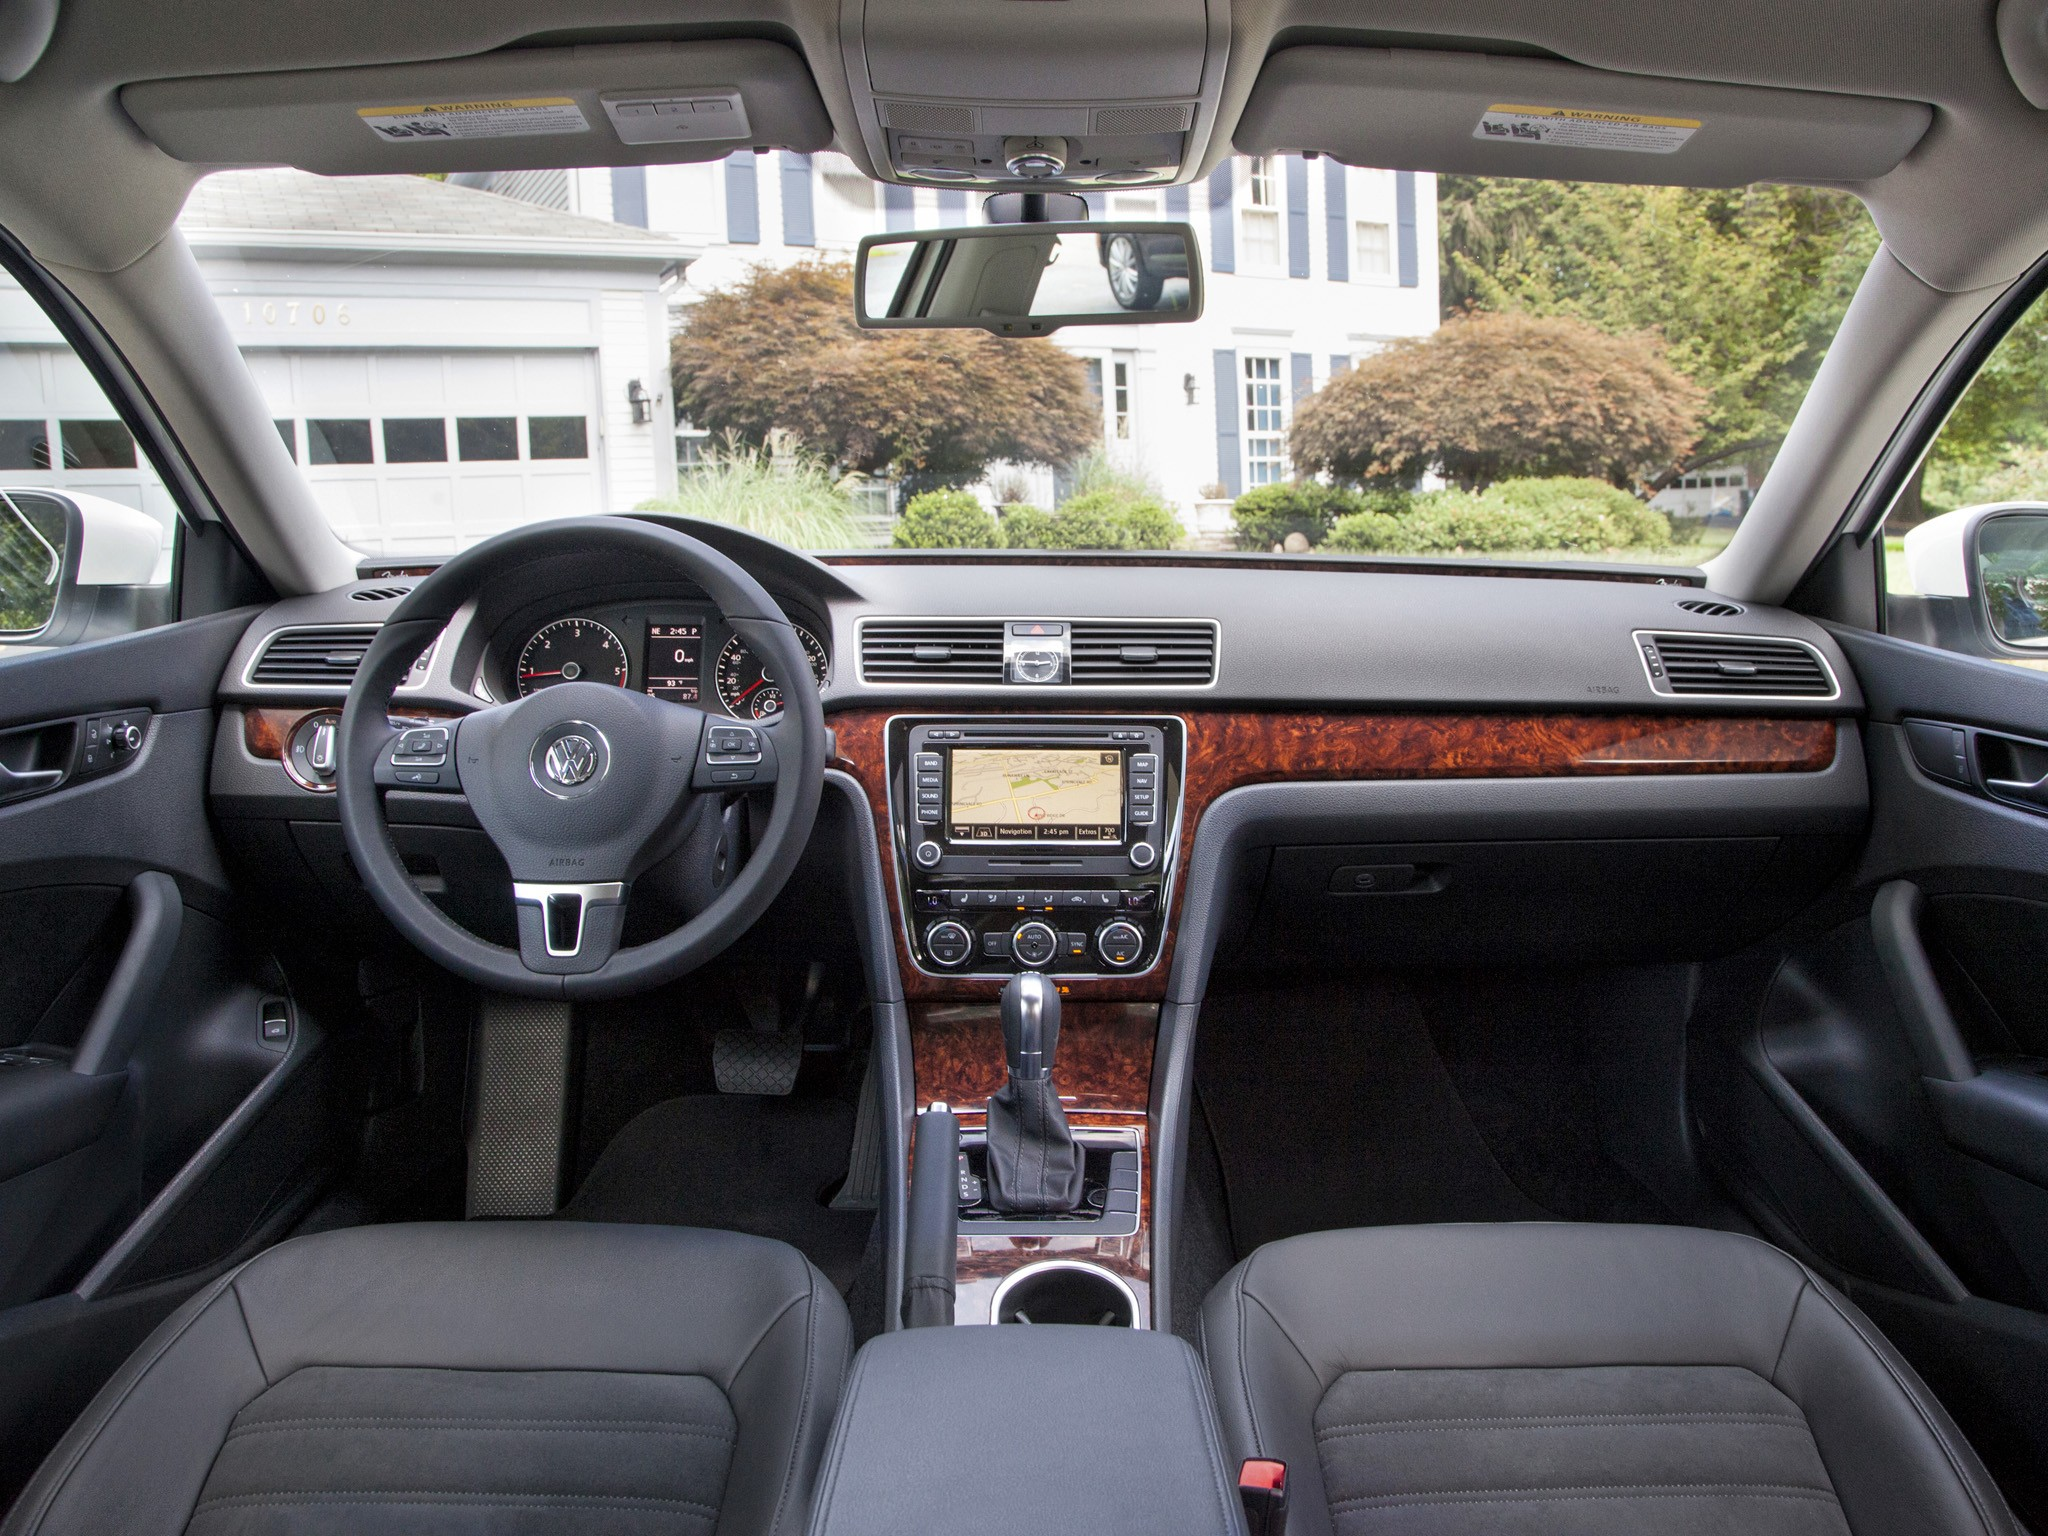 volkswagen passat us specs 2012 2013 2014 2015 2016 2017 rh autoevolution com 2013 Passat TDI Wallpaper 2013 Volkswagen Passat TDI Sel